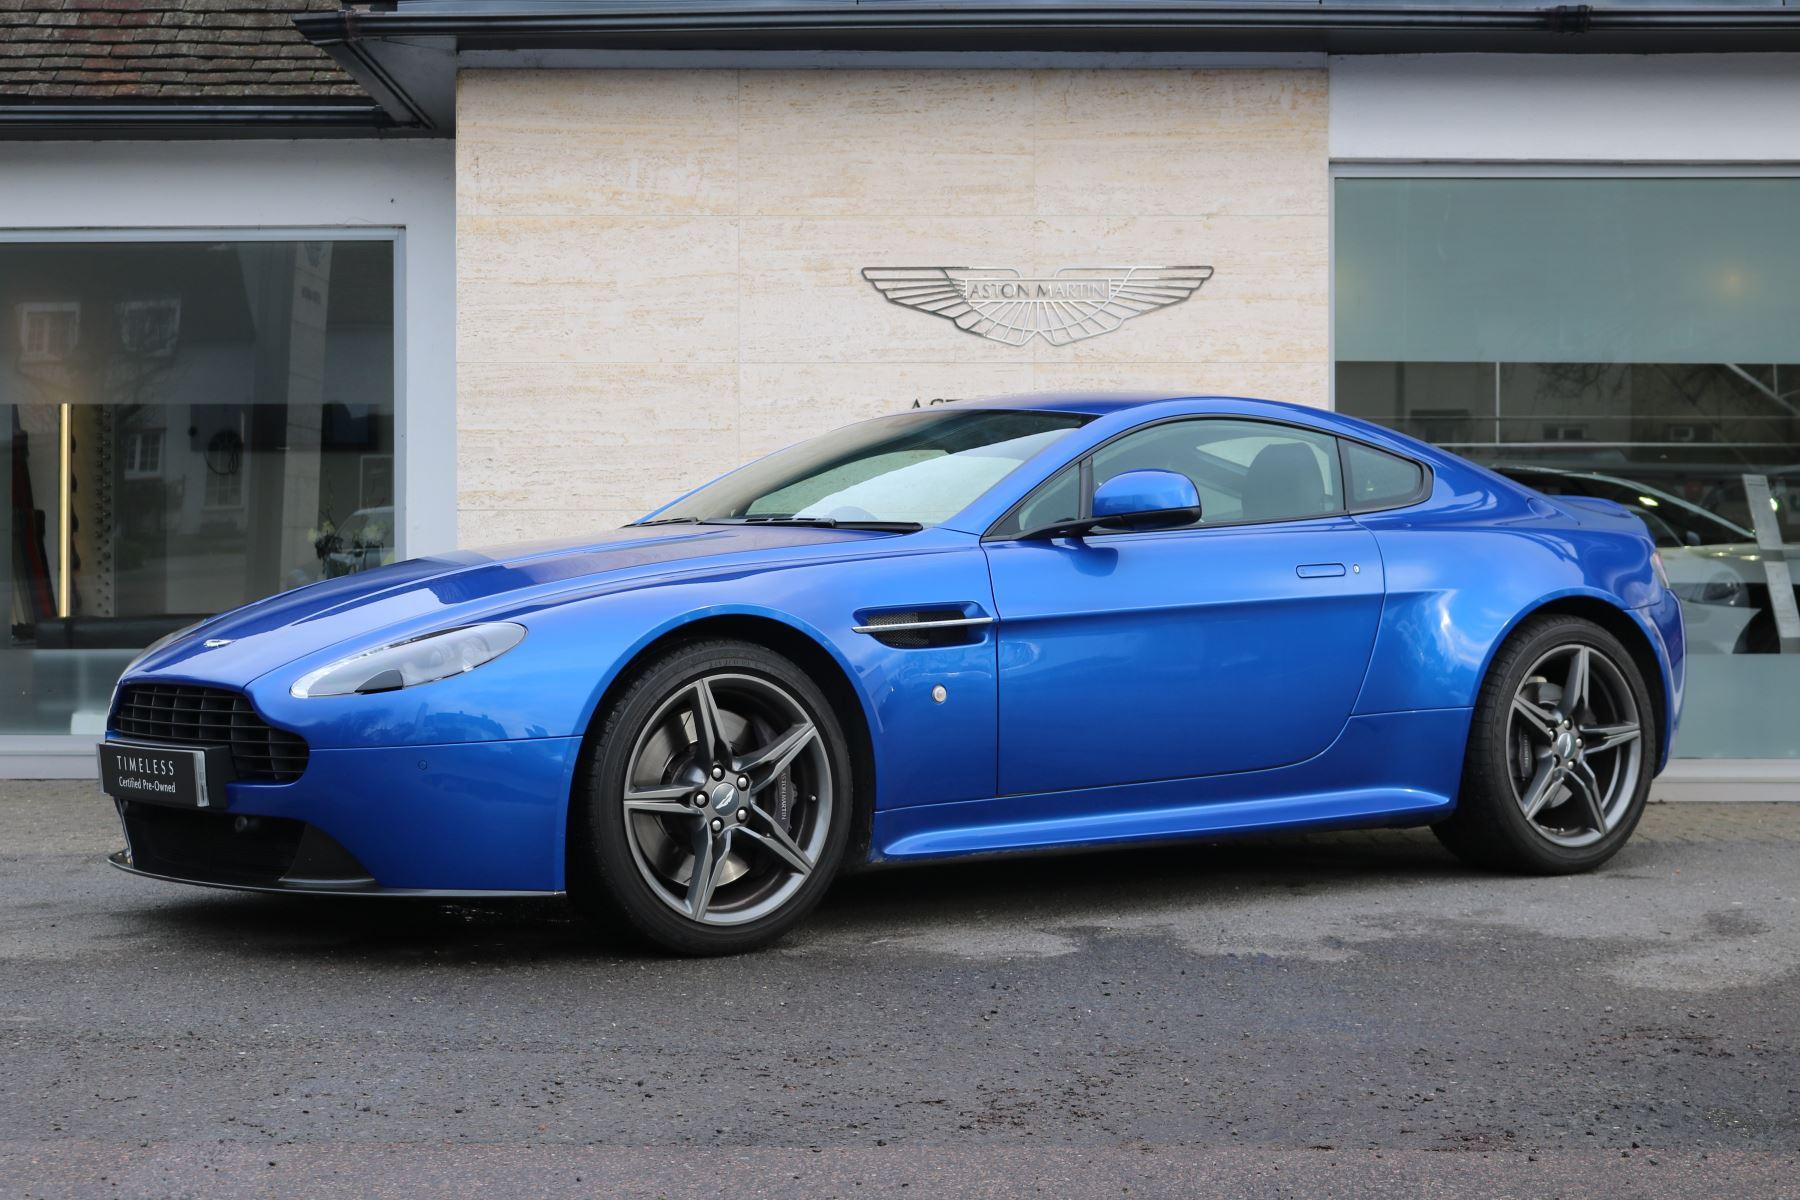 Aston Martin V8 Vantage S S 2dr Sportshift image 1